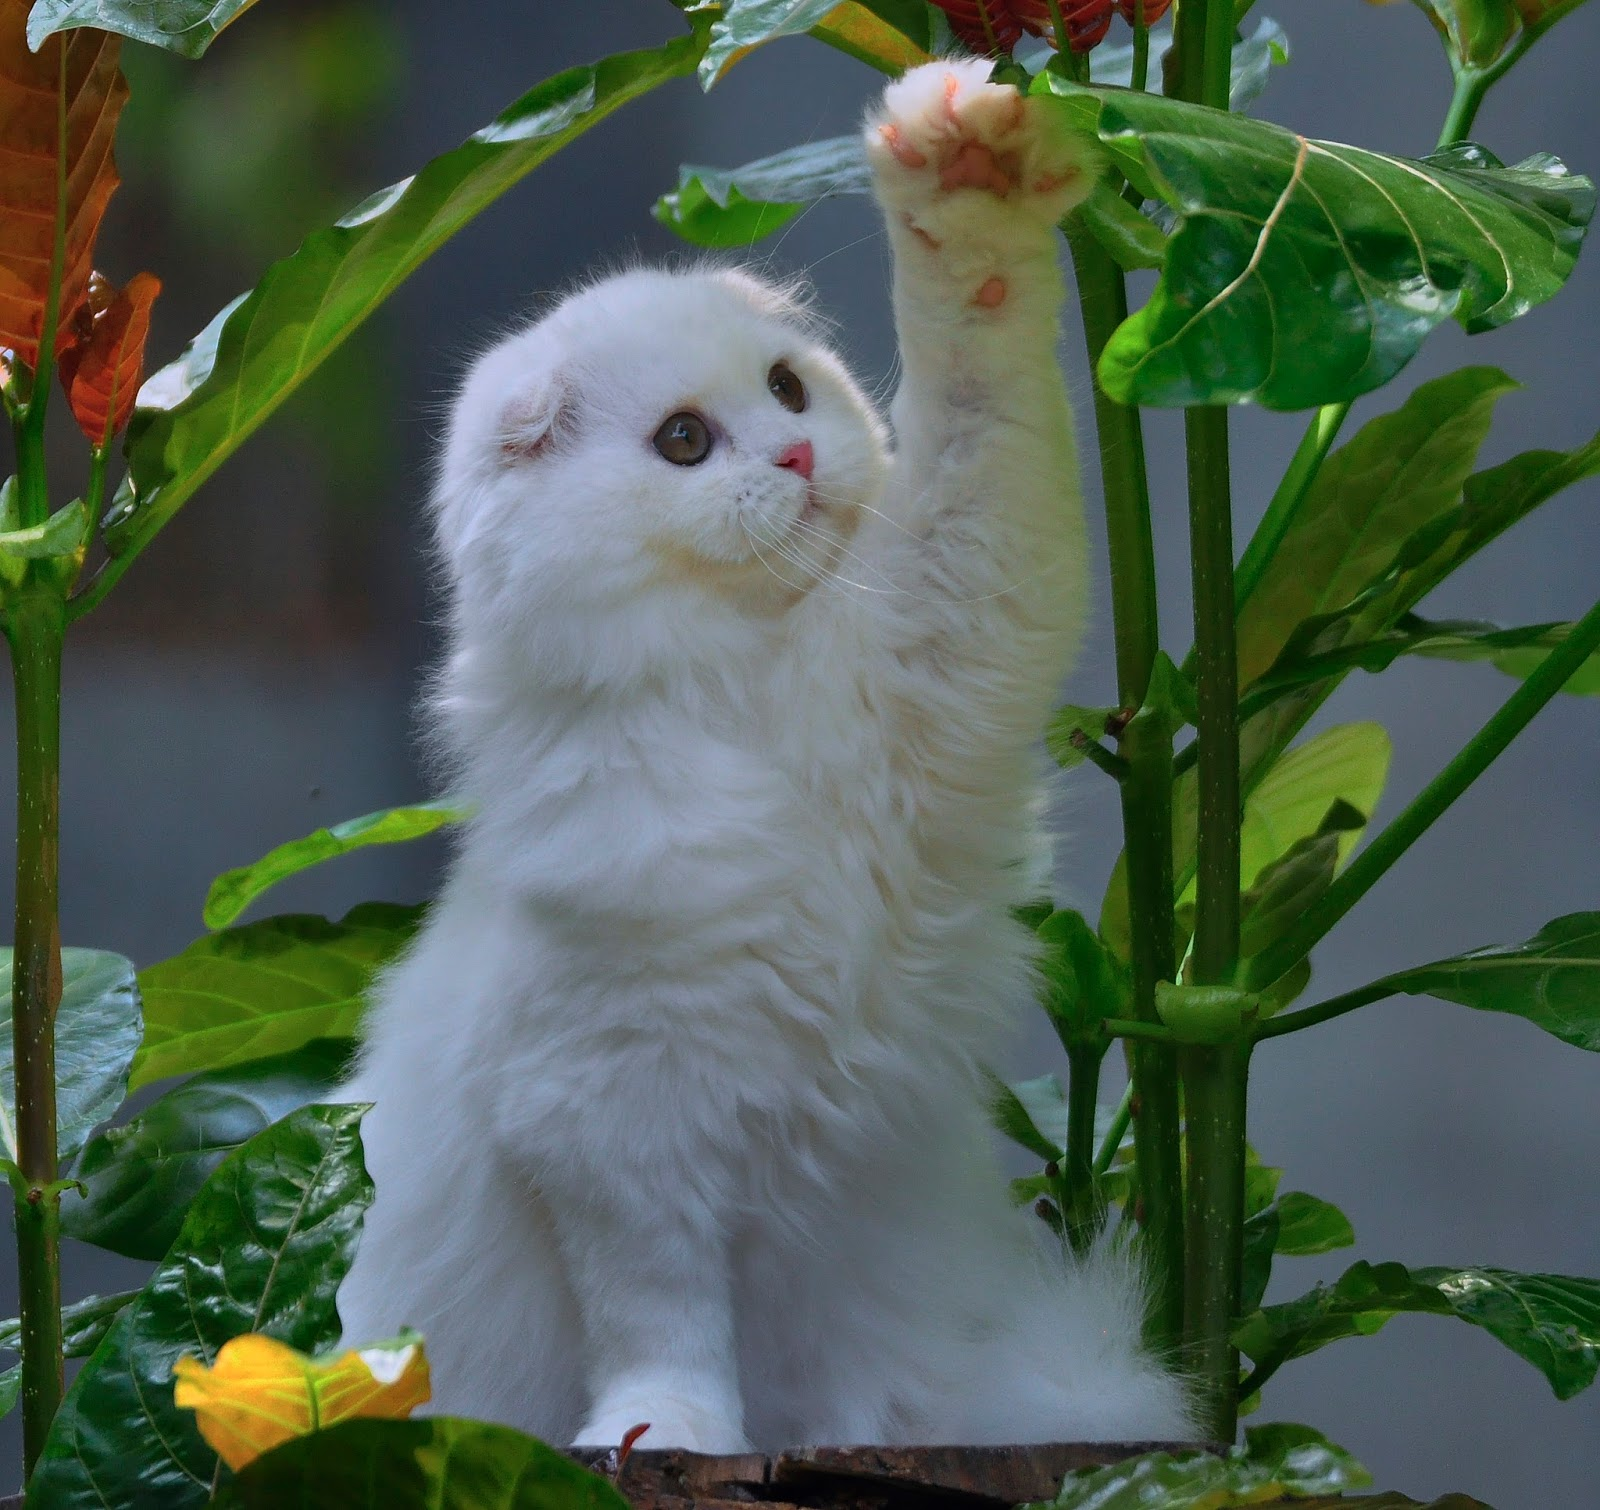 Gambar Kucing Editan Wajah Manusia godean.web.id